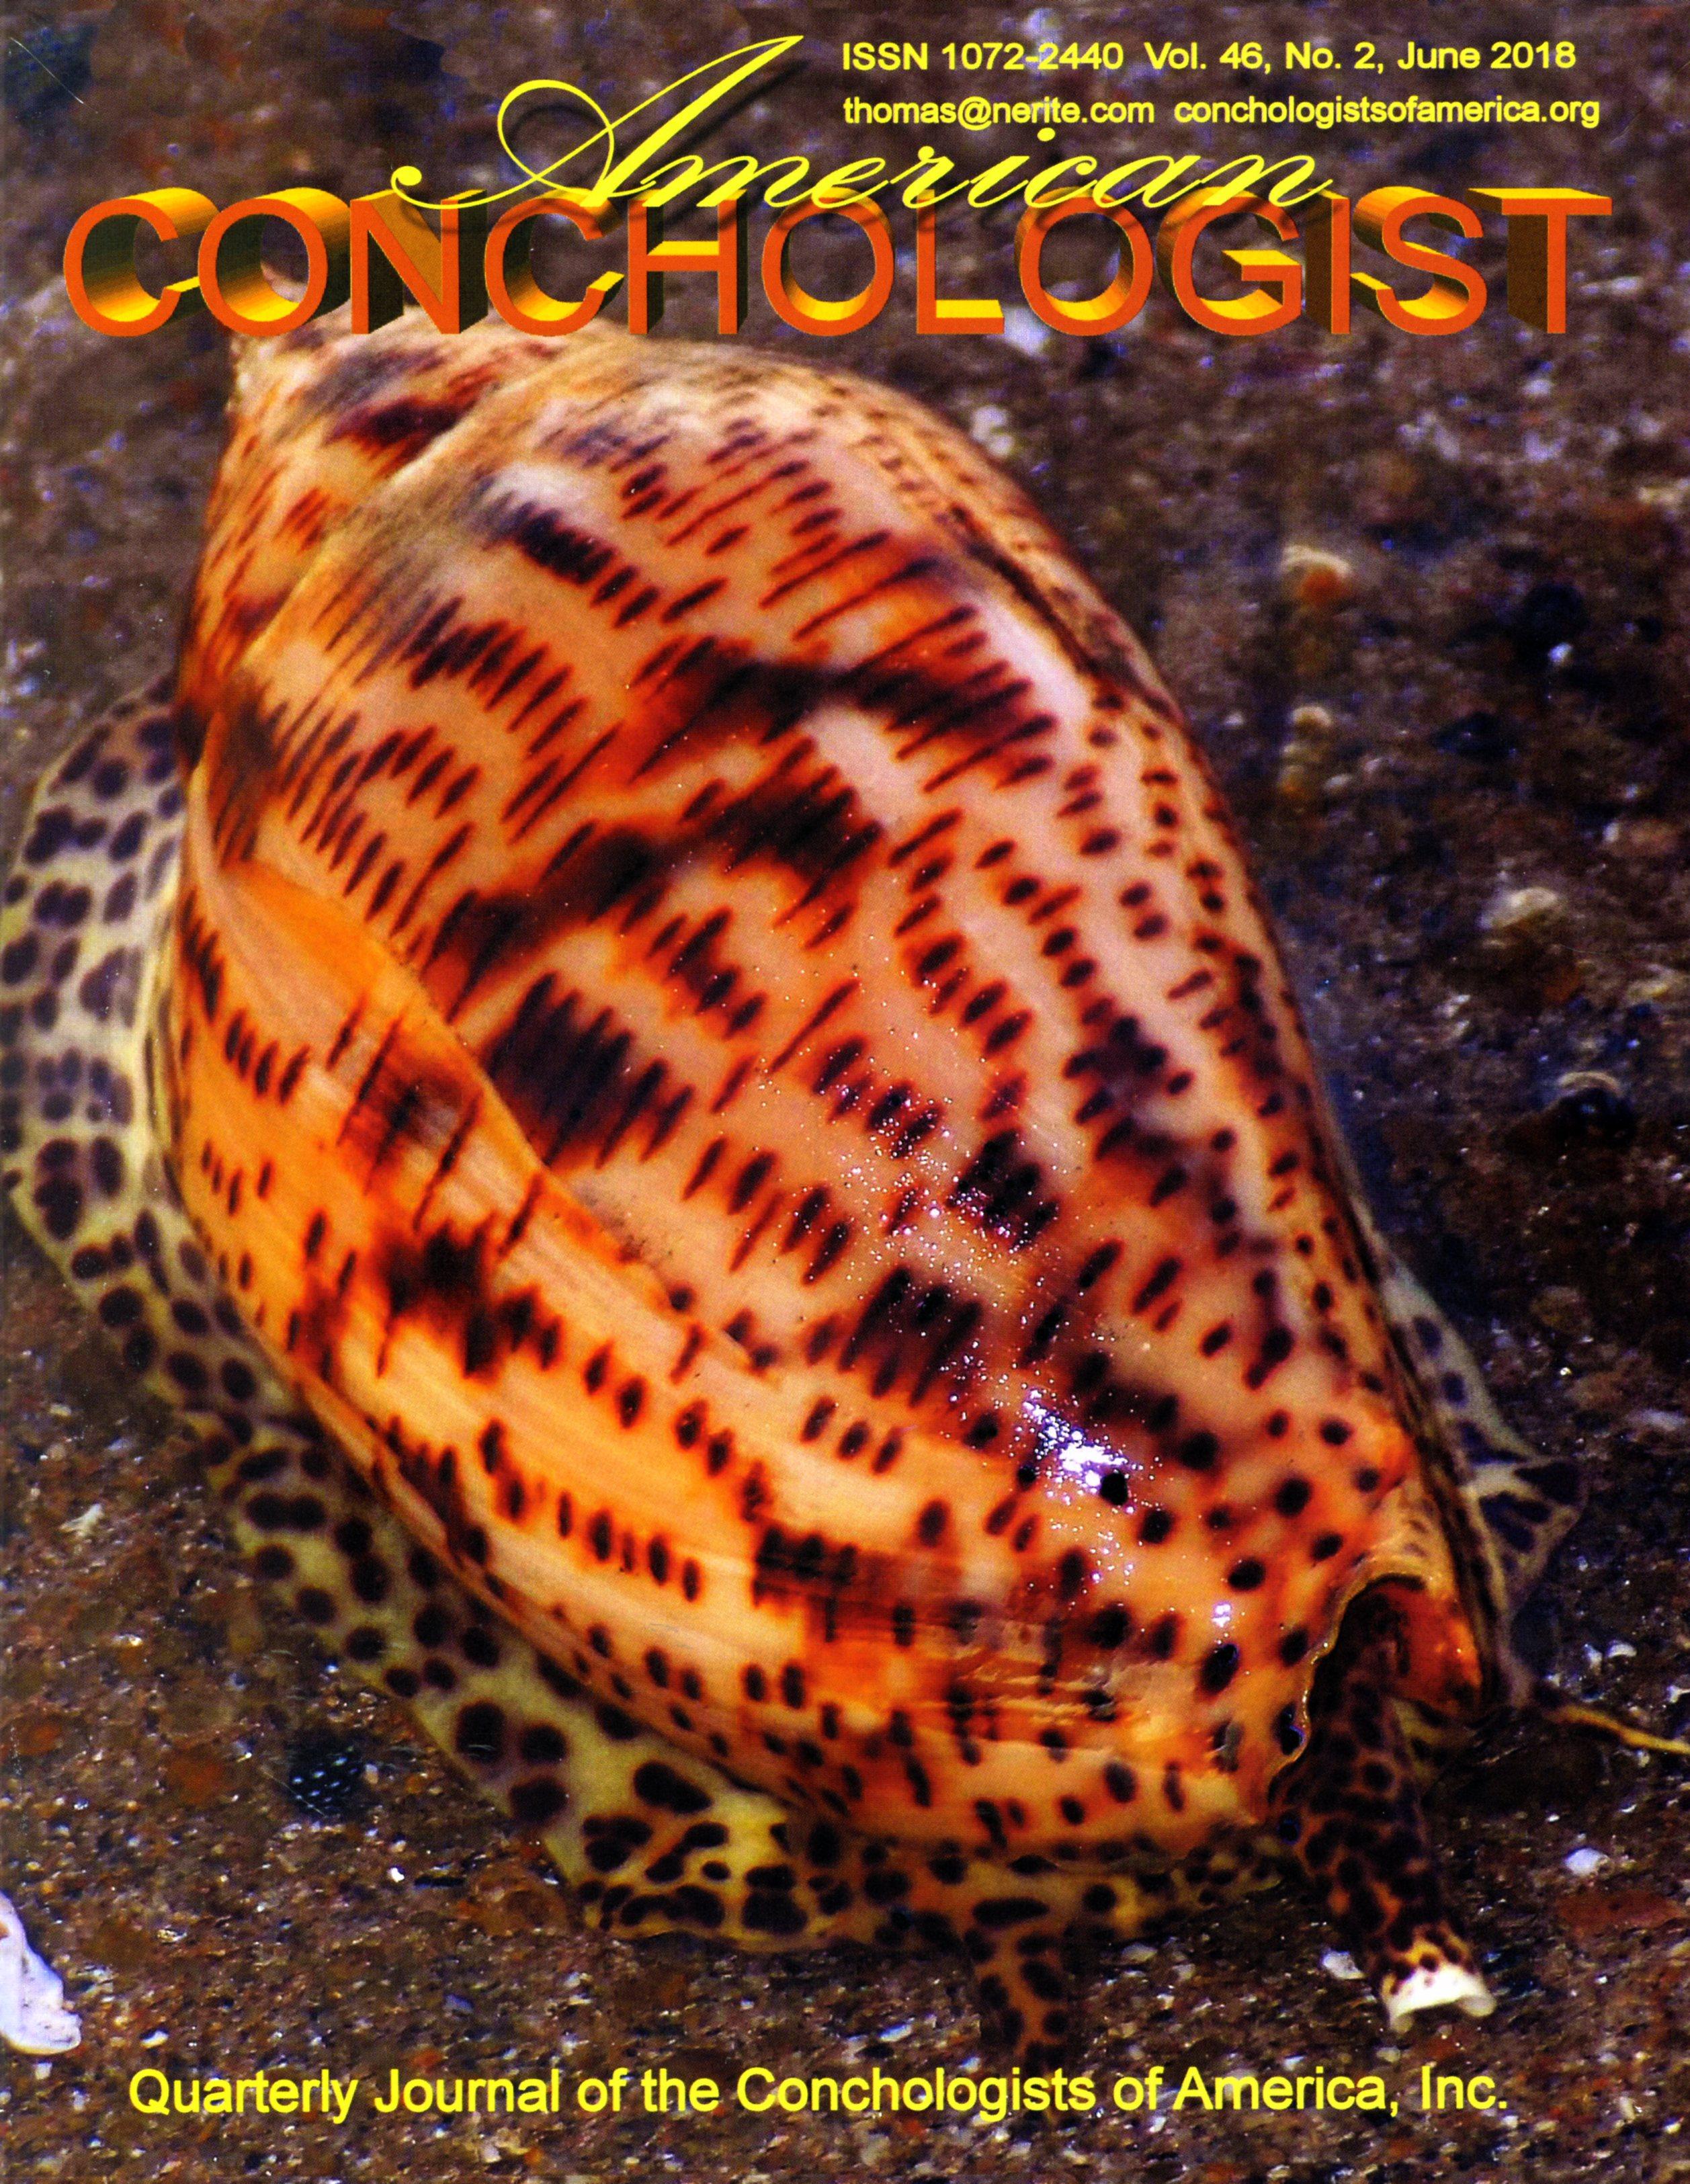 CONCHOLOGIST OF AMERICA 4622018